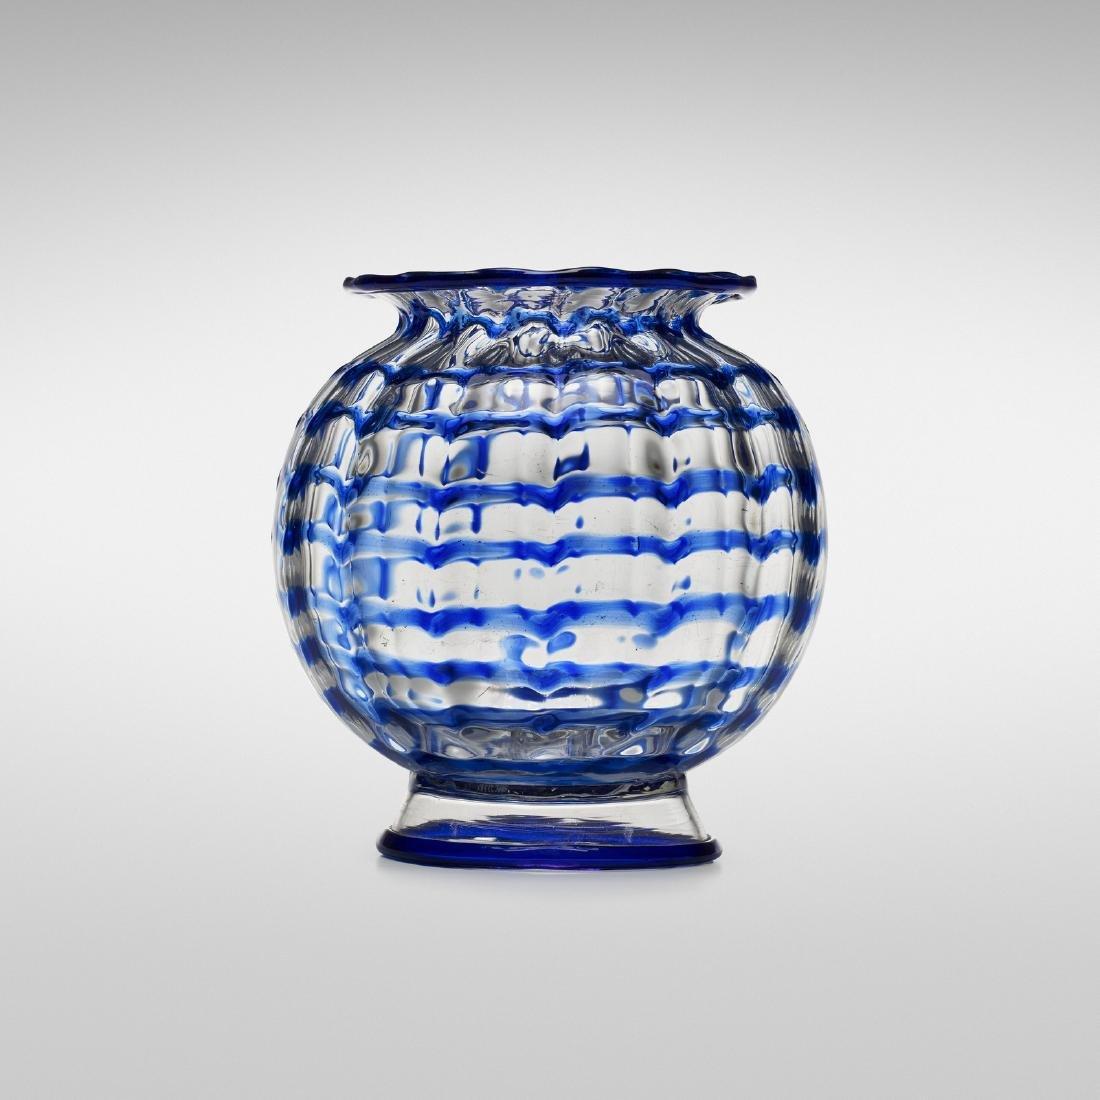 Carlo Scarpa, Decoro Fenicio vase, model 6446